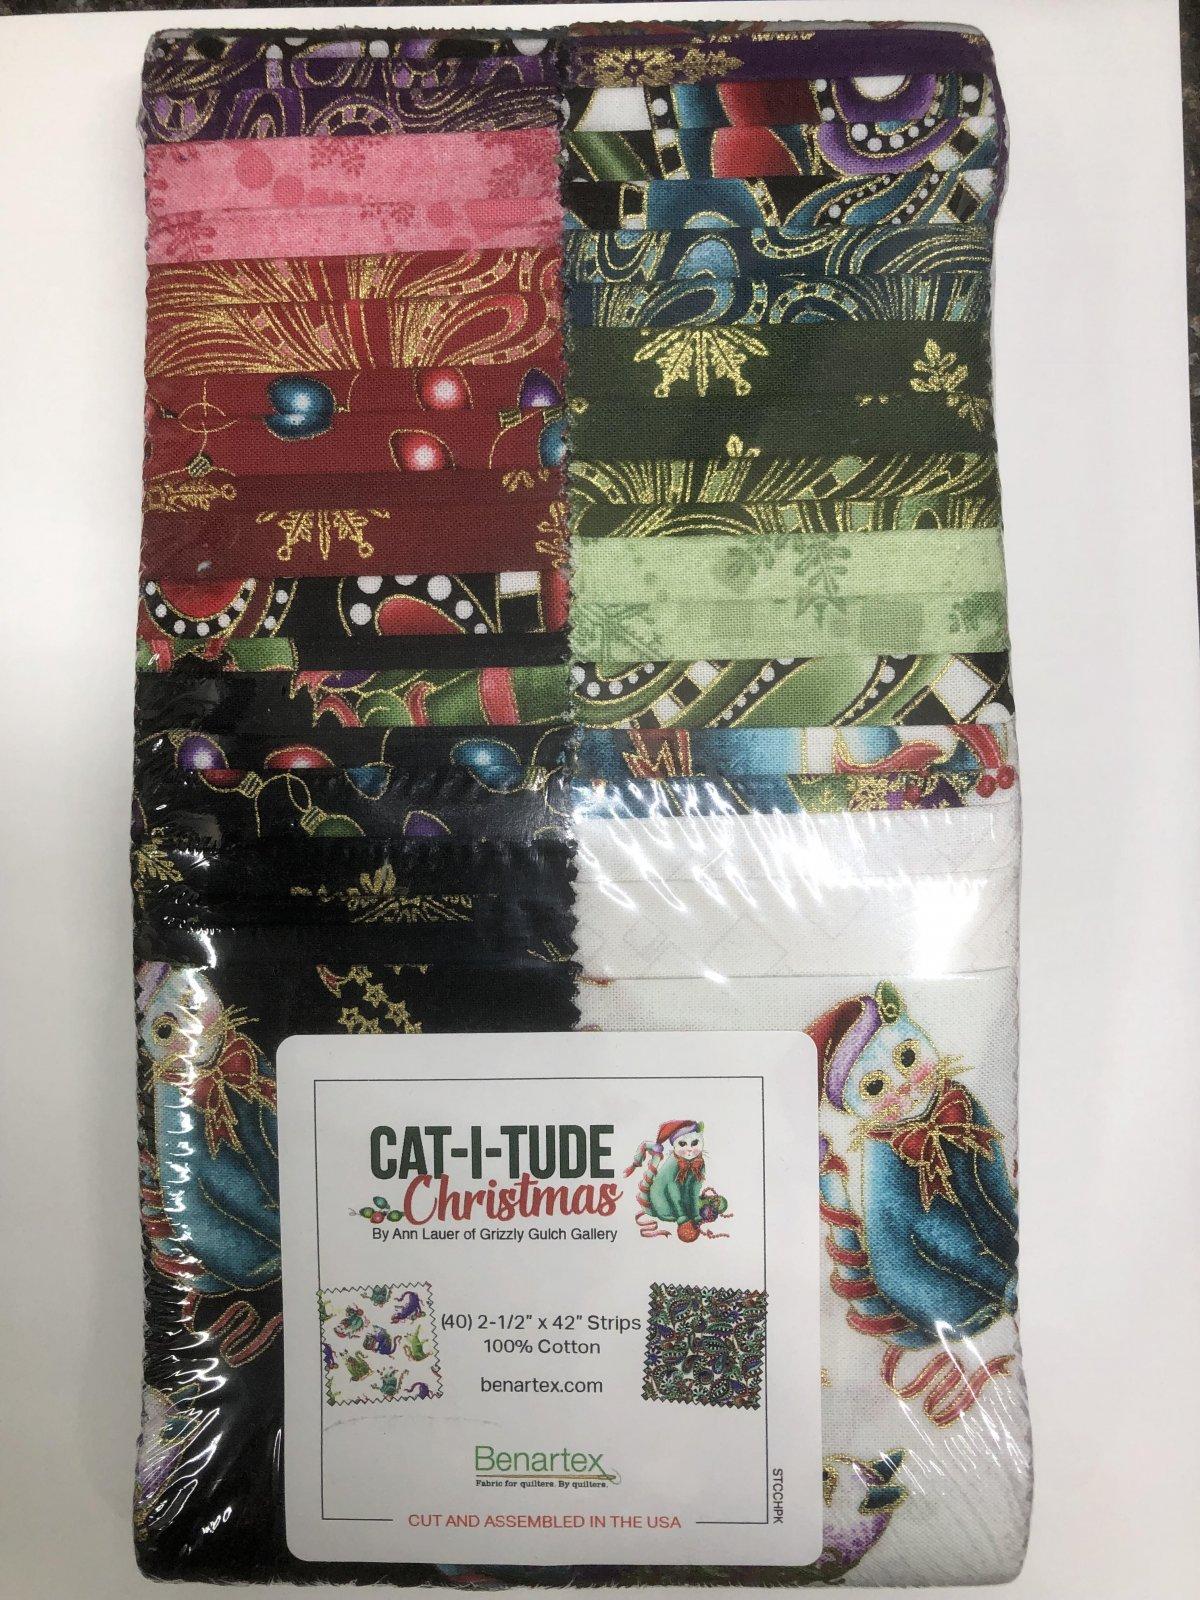 2.5 inch STRIPS:  Cat-i-tude Christmas by Benartex - 40 piece 2.5 inch Fabric Strips Flat Pack